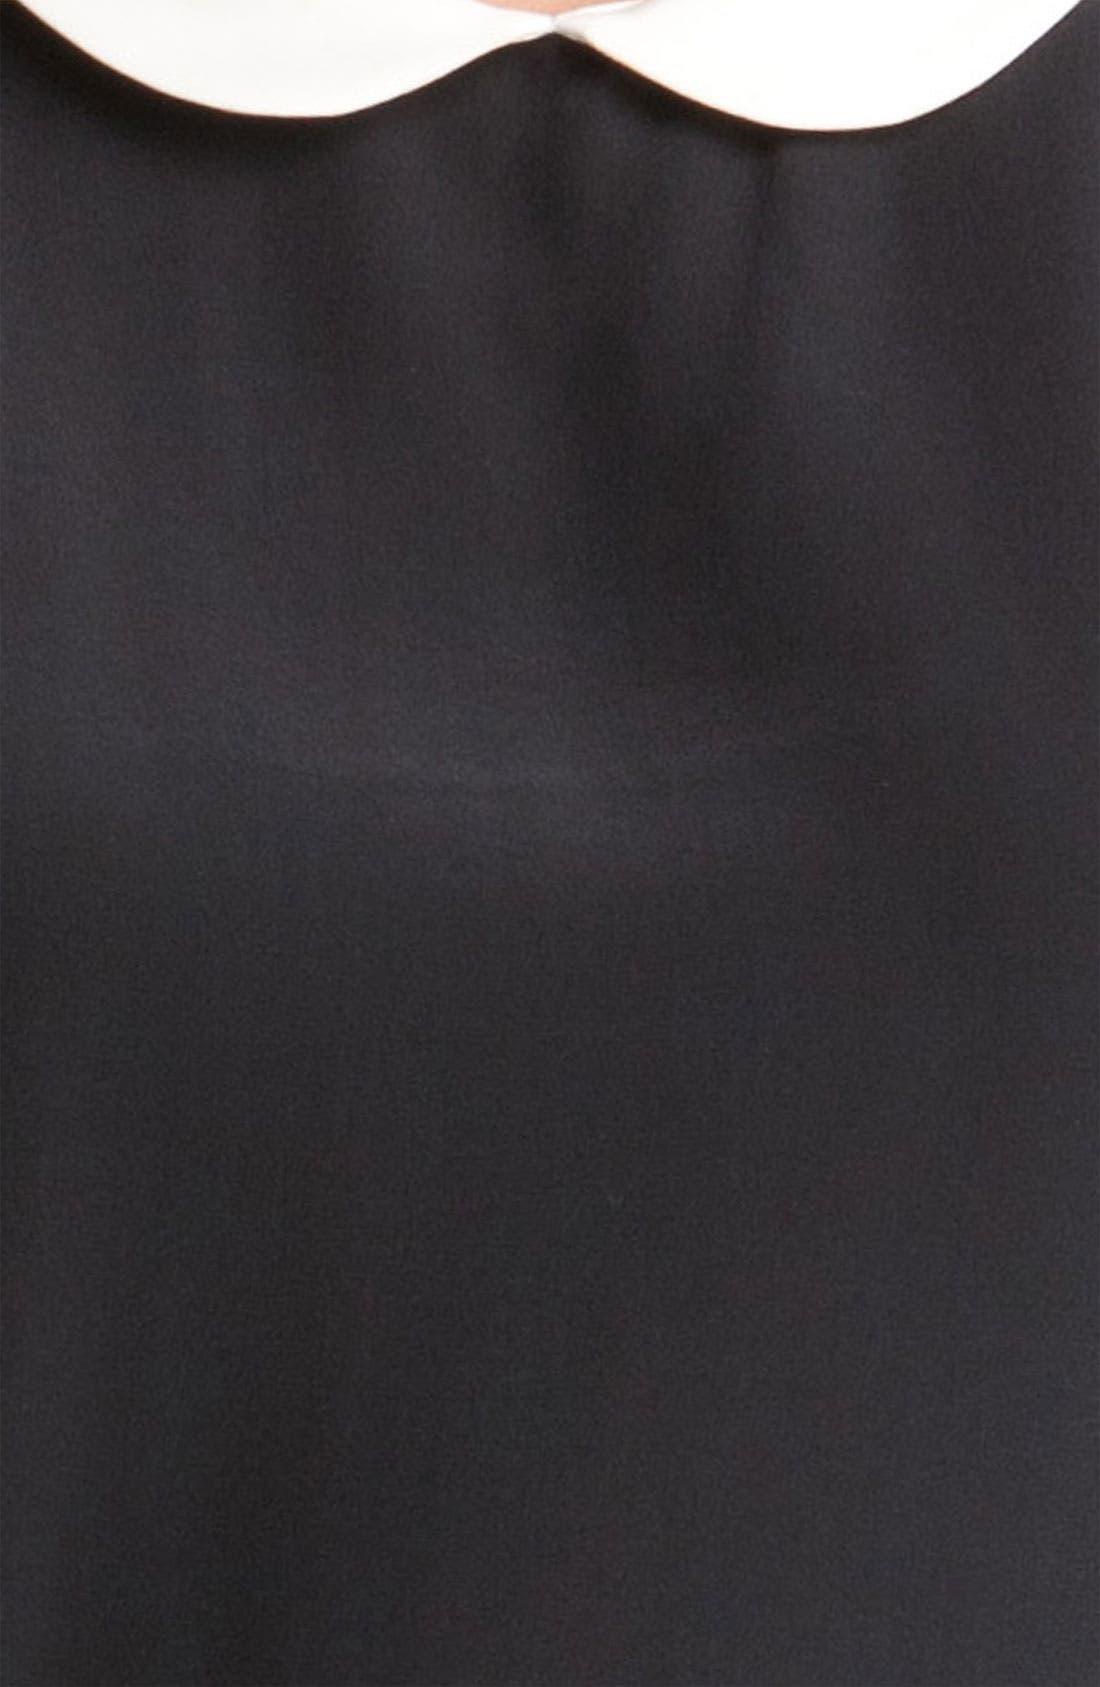 Alternate Image 3  - kate spade new york 'jensen' silk top